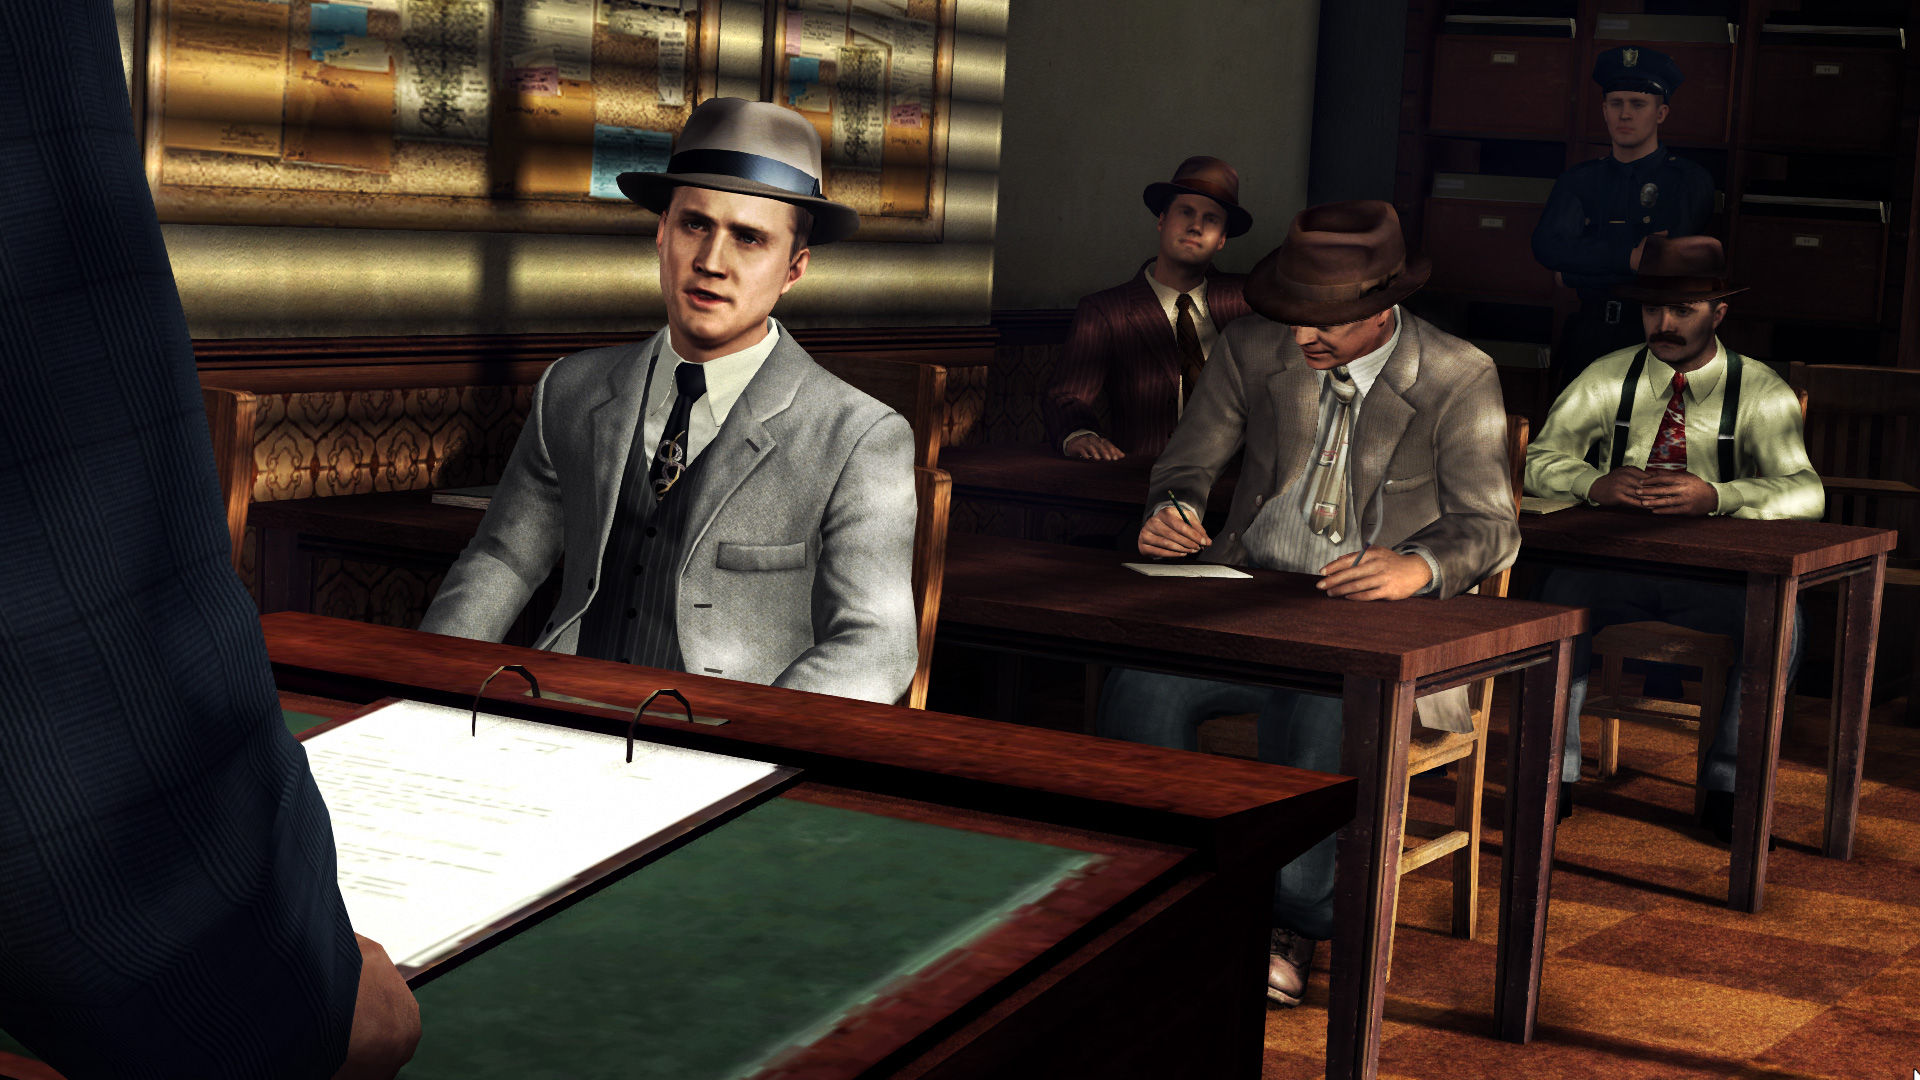 Виски, шляпа, револьвер: обзор L.A. Noire Remastered